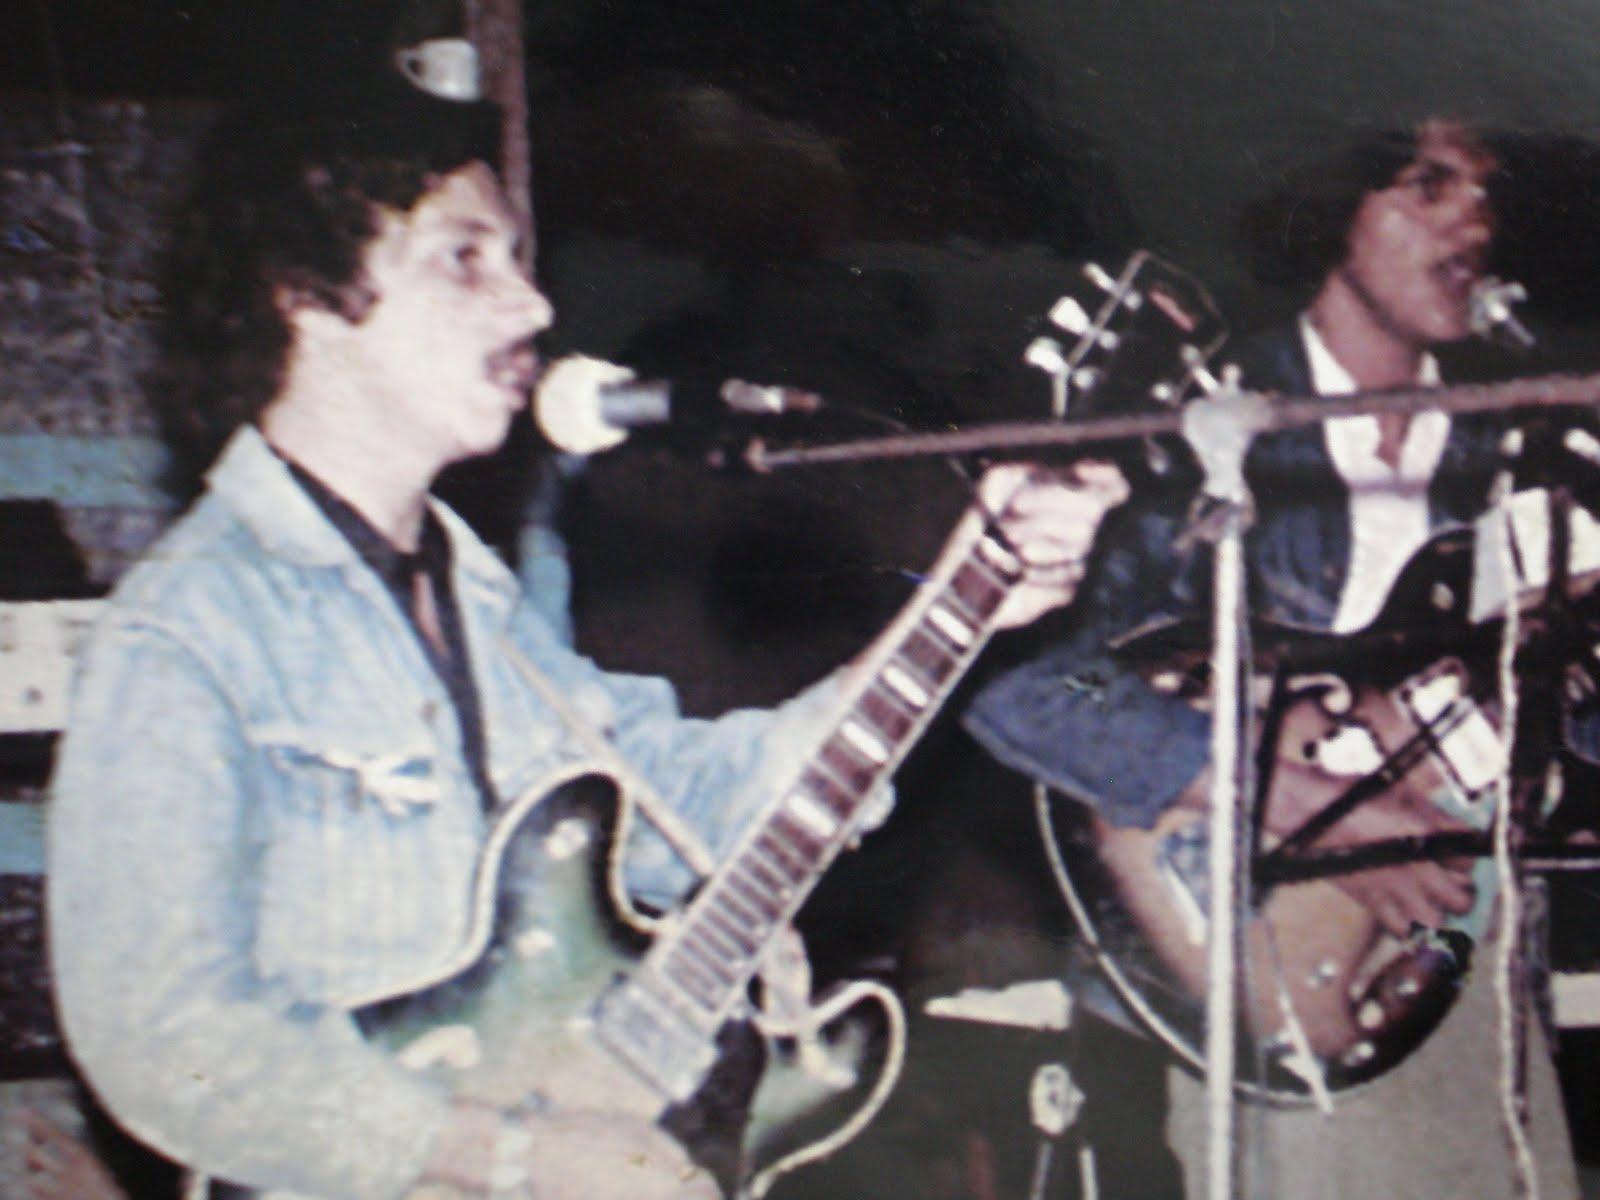 1973. Noite fria, julhosa